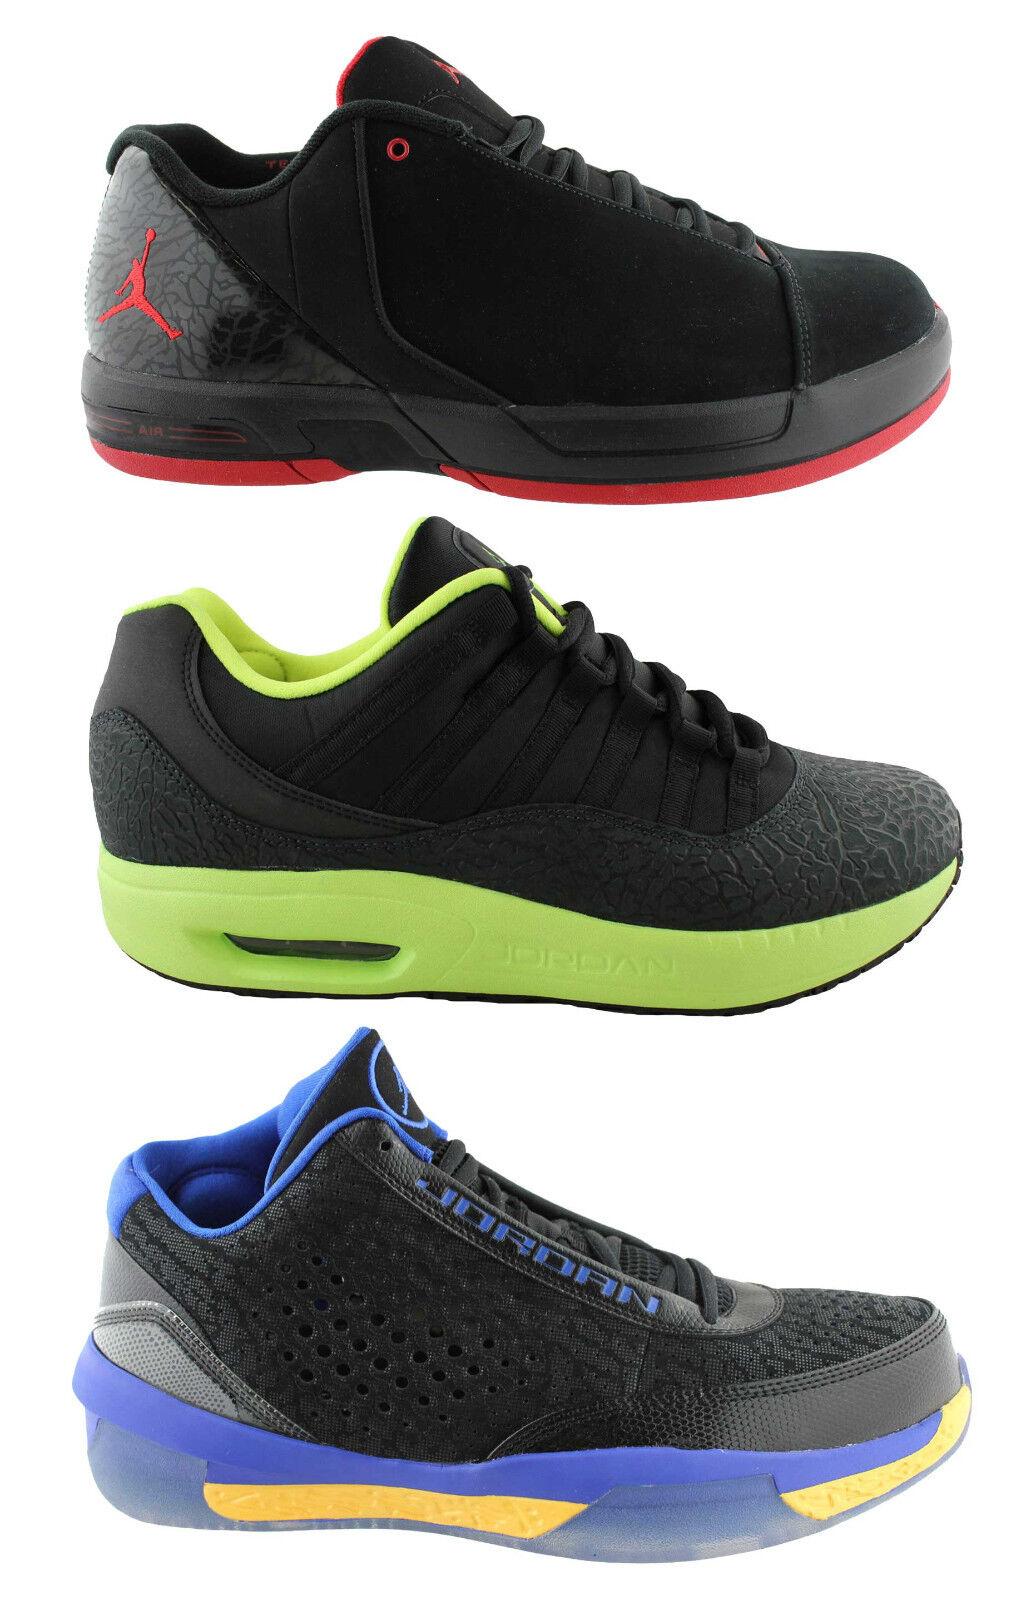 NIKE JORDAN homme ON chaussures/Baskets/BASKETBALL/HI TOPS/SPORT ON homme EBAY AUSTRALIA 2e17fa